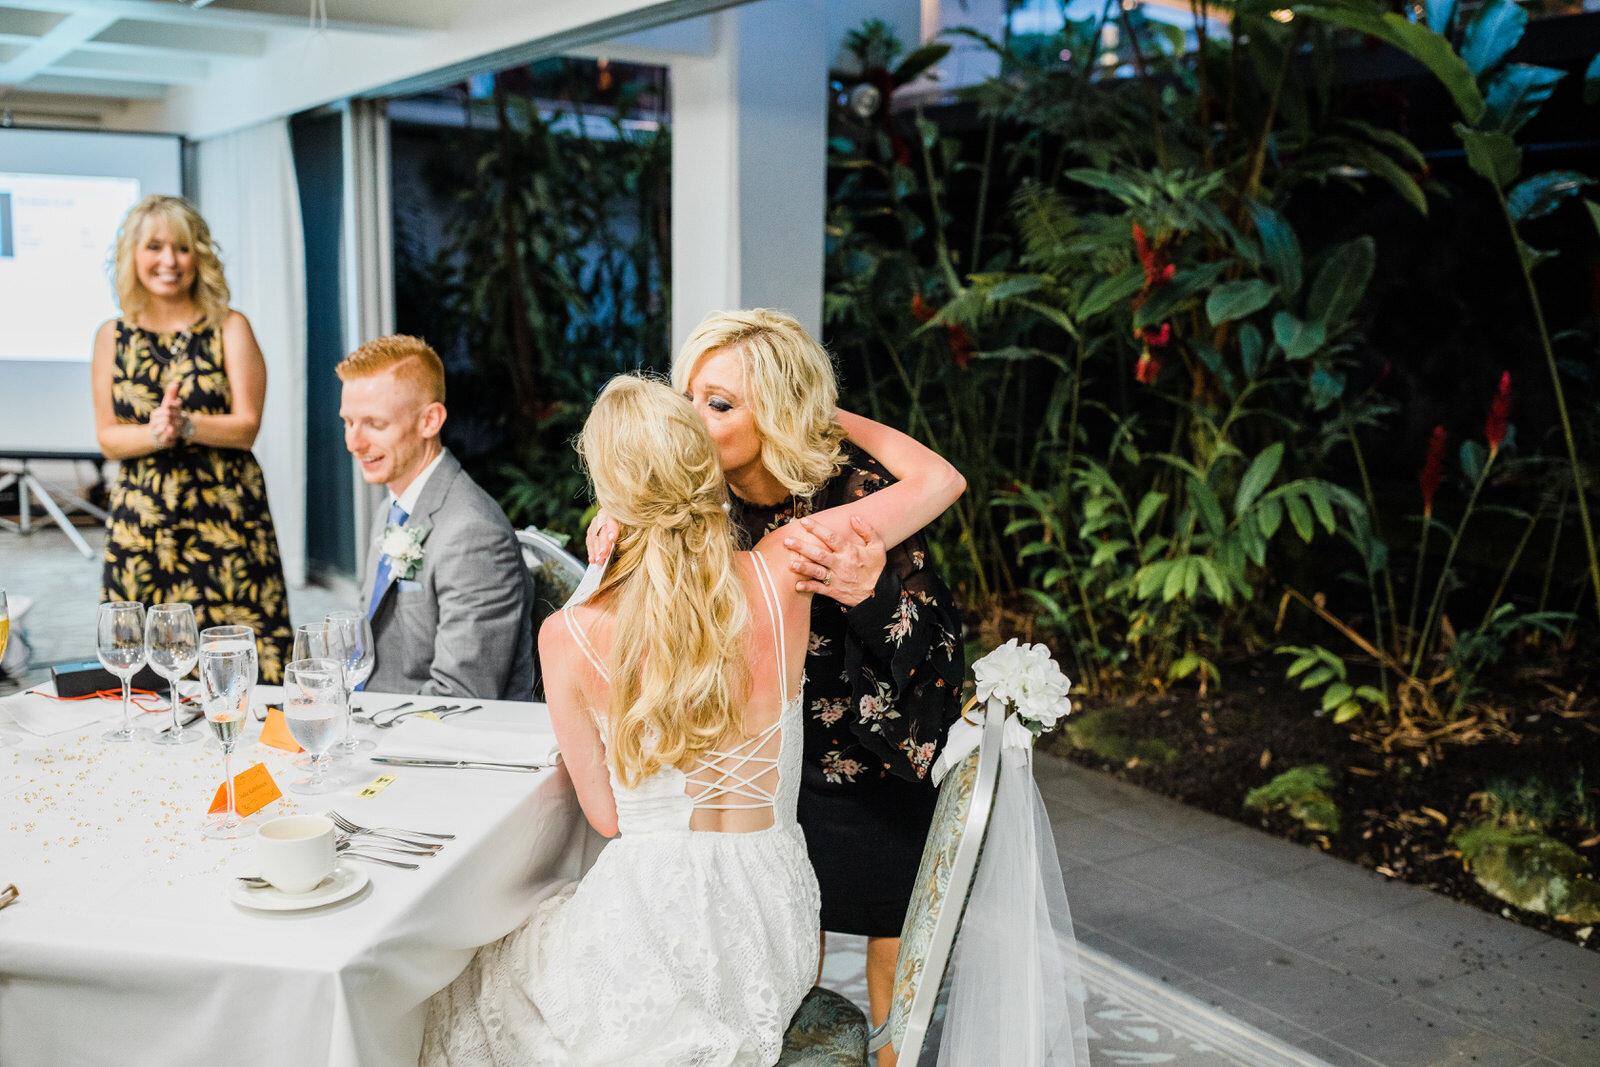 small-wedding-hawaii-destination-hilton-coconut-island-0464.jpg